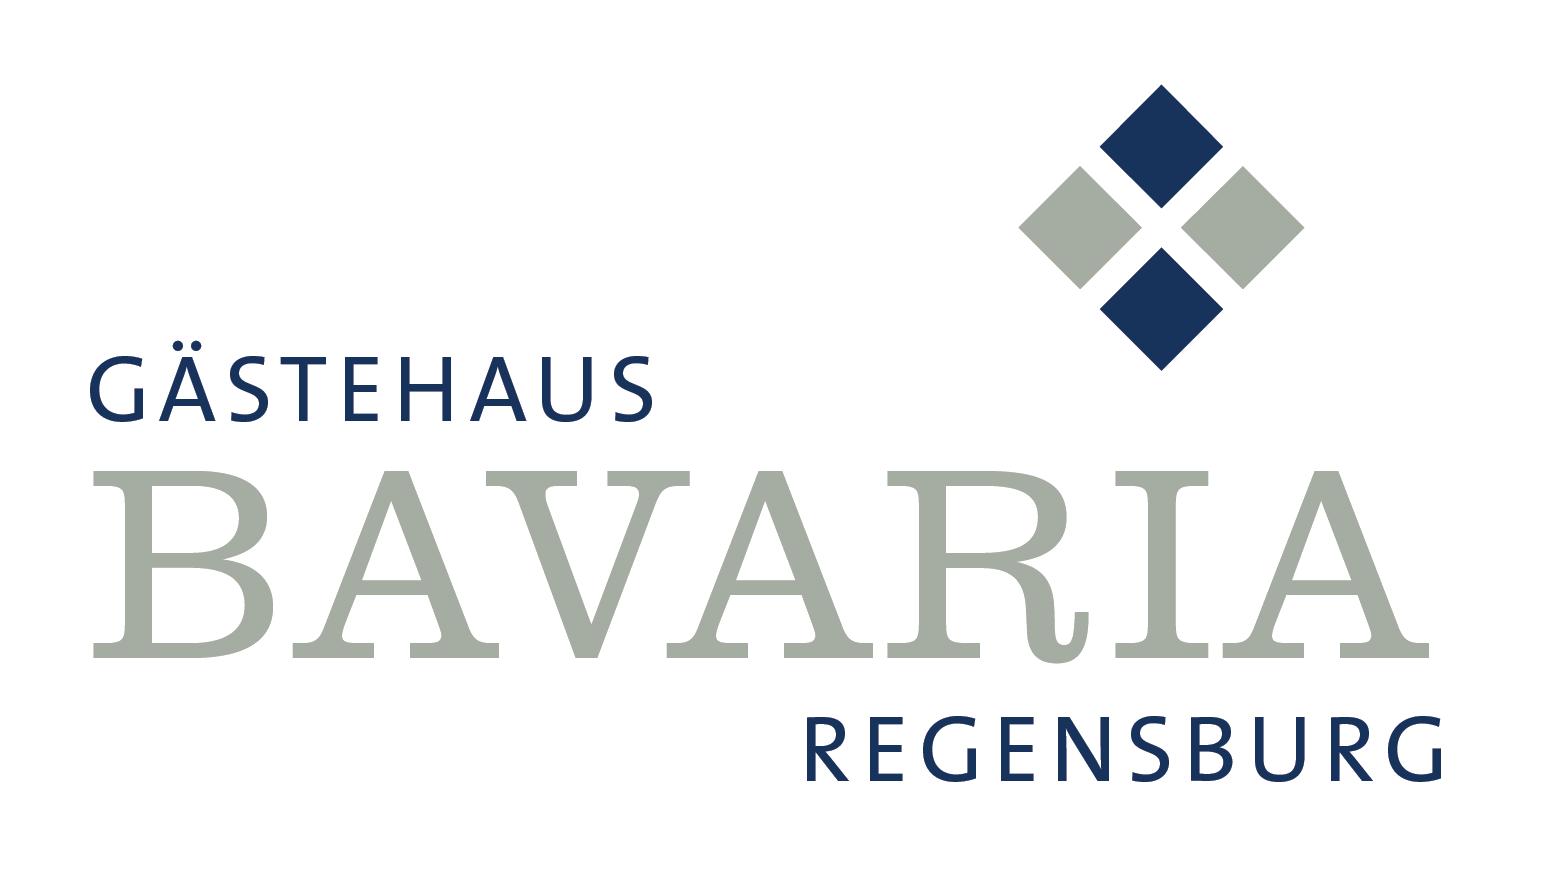 Gästehaus Bavaria in Regensburg